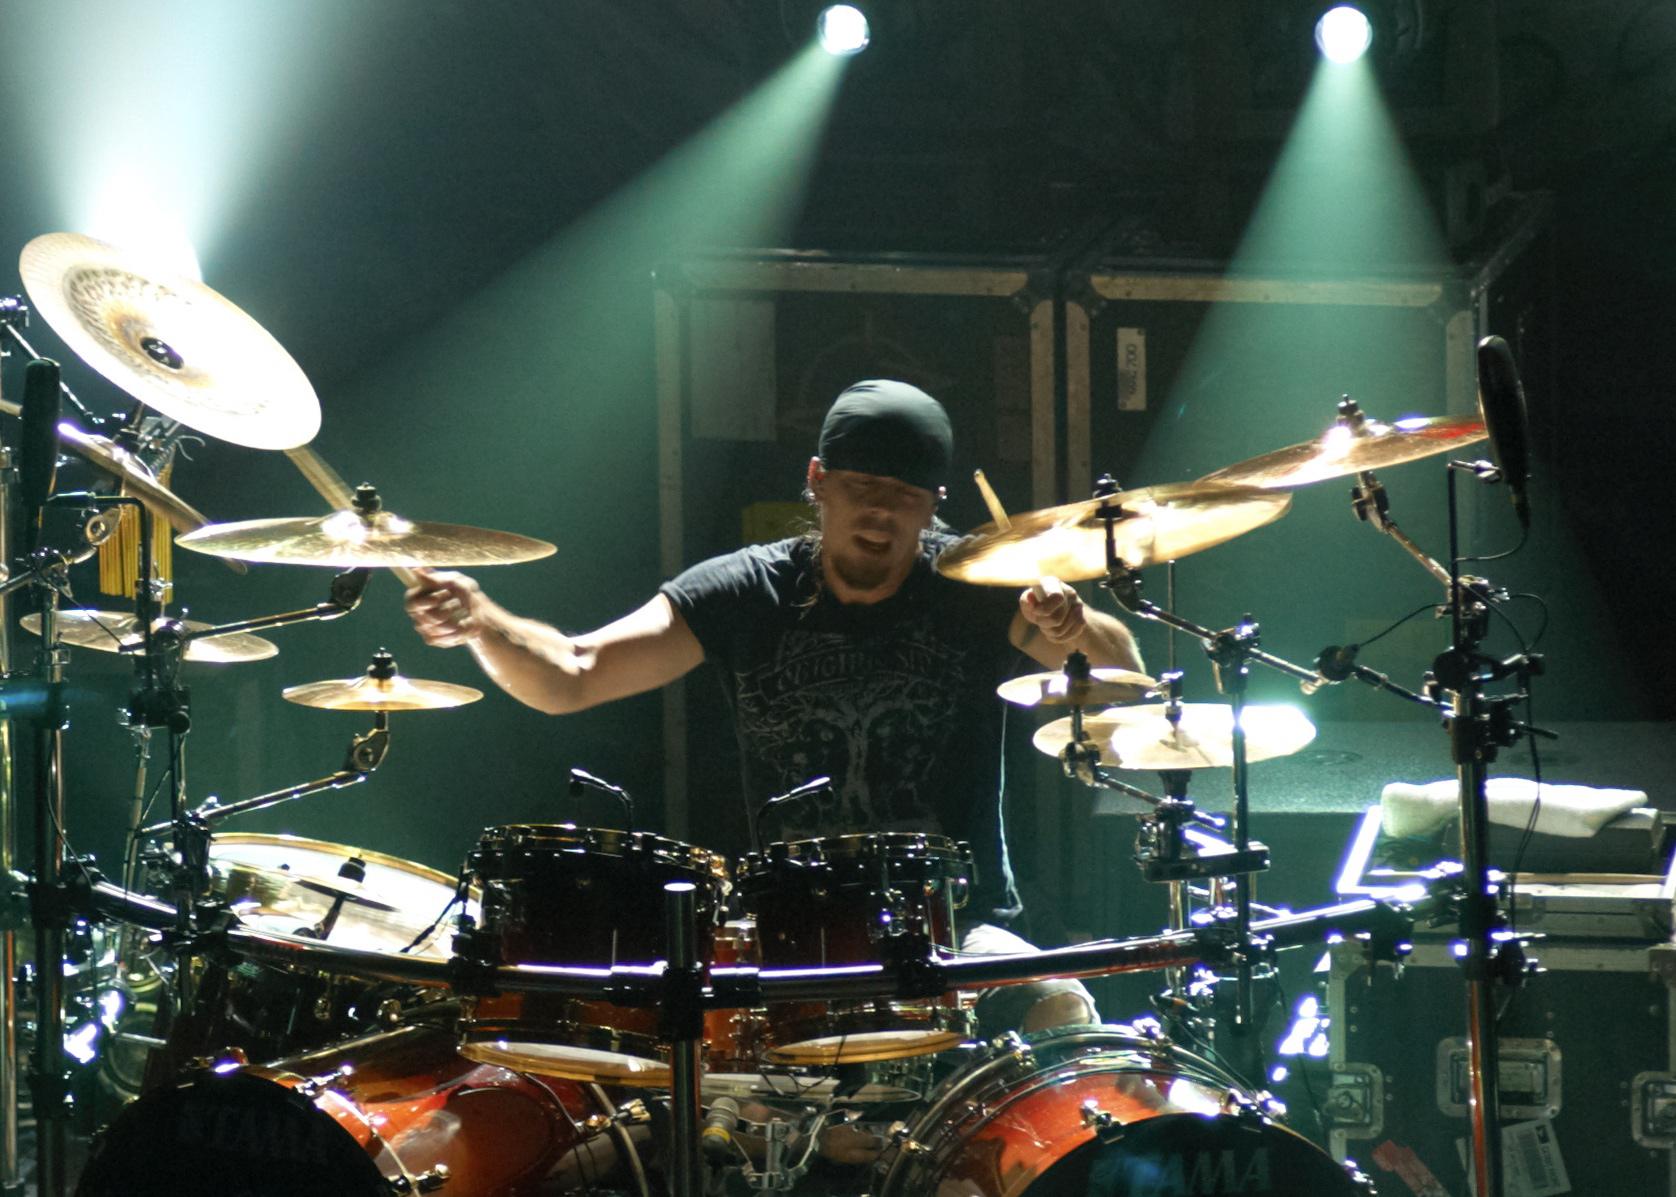 http://en.academic.ru/pictures/enwiki/74/Jukka-Nevalainen-drums.jpg